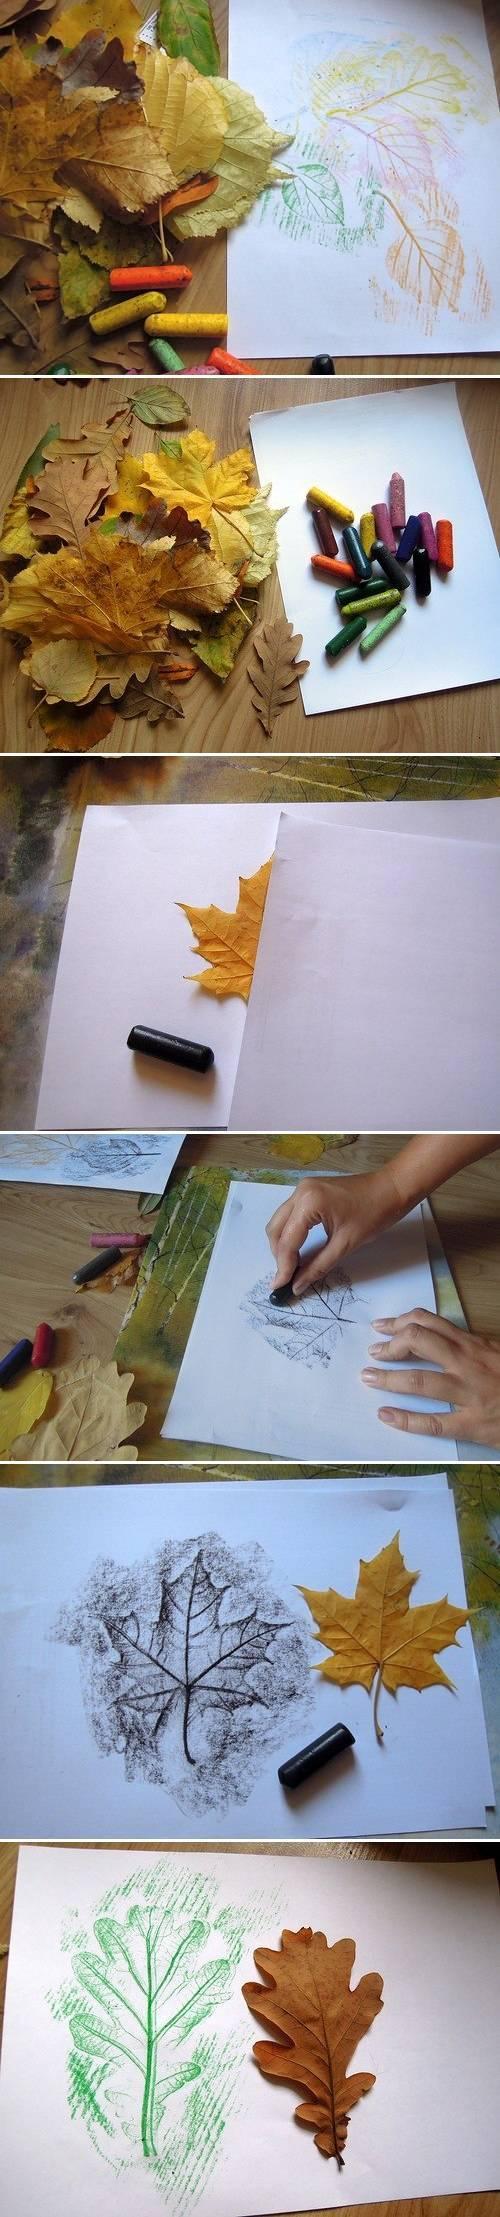 DIY Draw Leaves